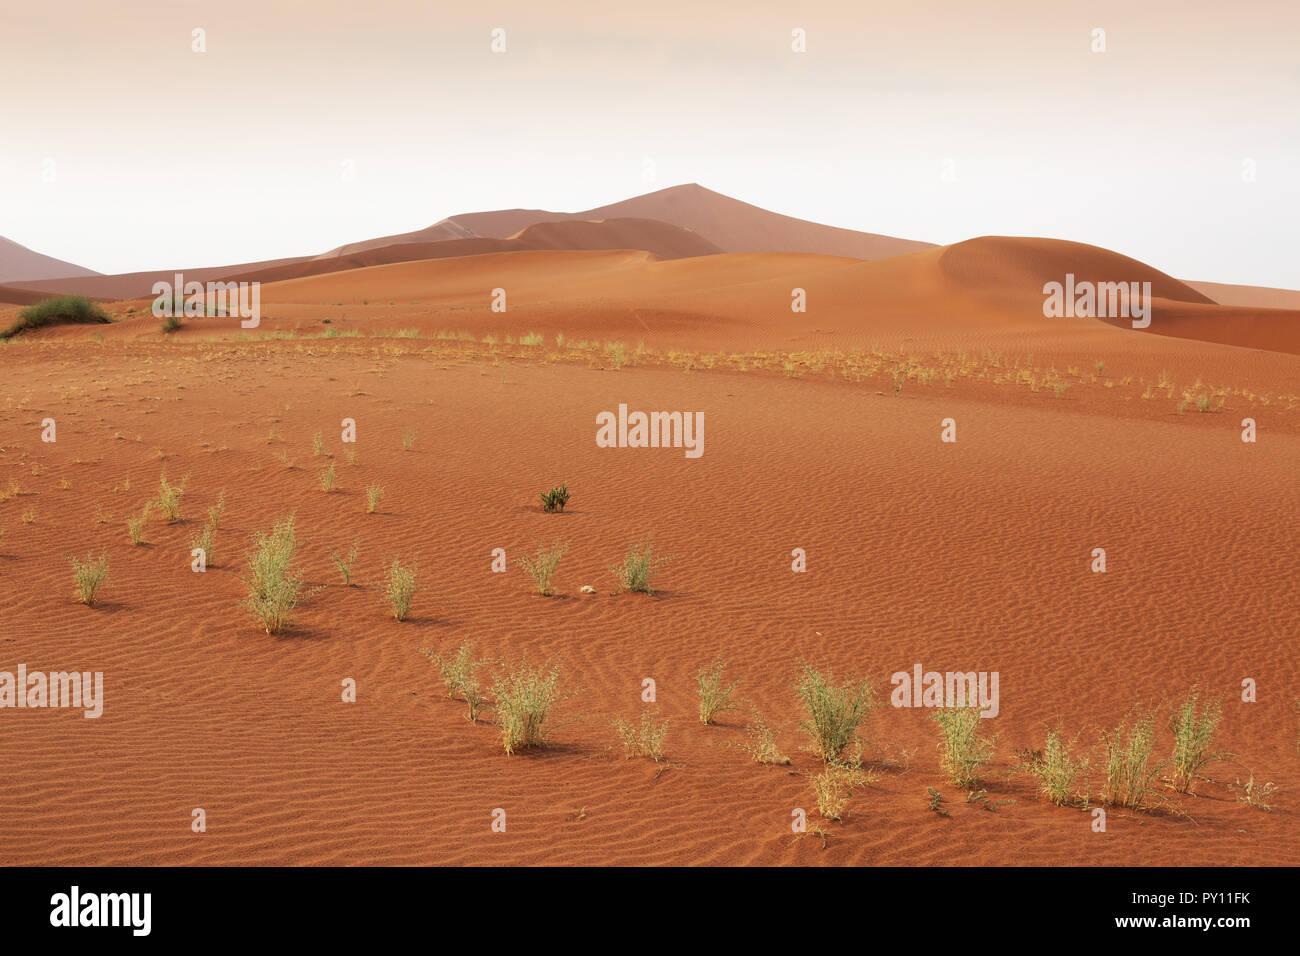 Namibia Sanddünen in der Namib Wüste im Sossusvlei Namibia Afrika Stockfoto